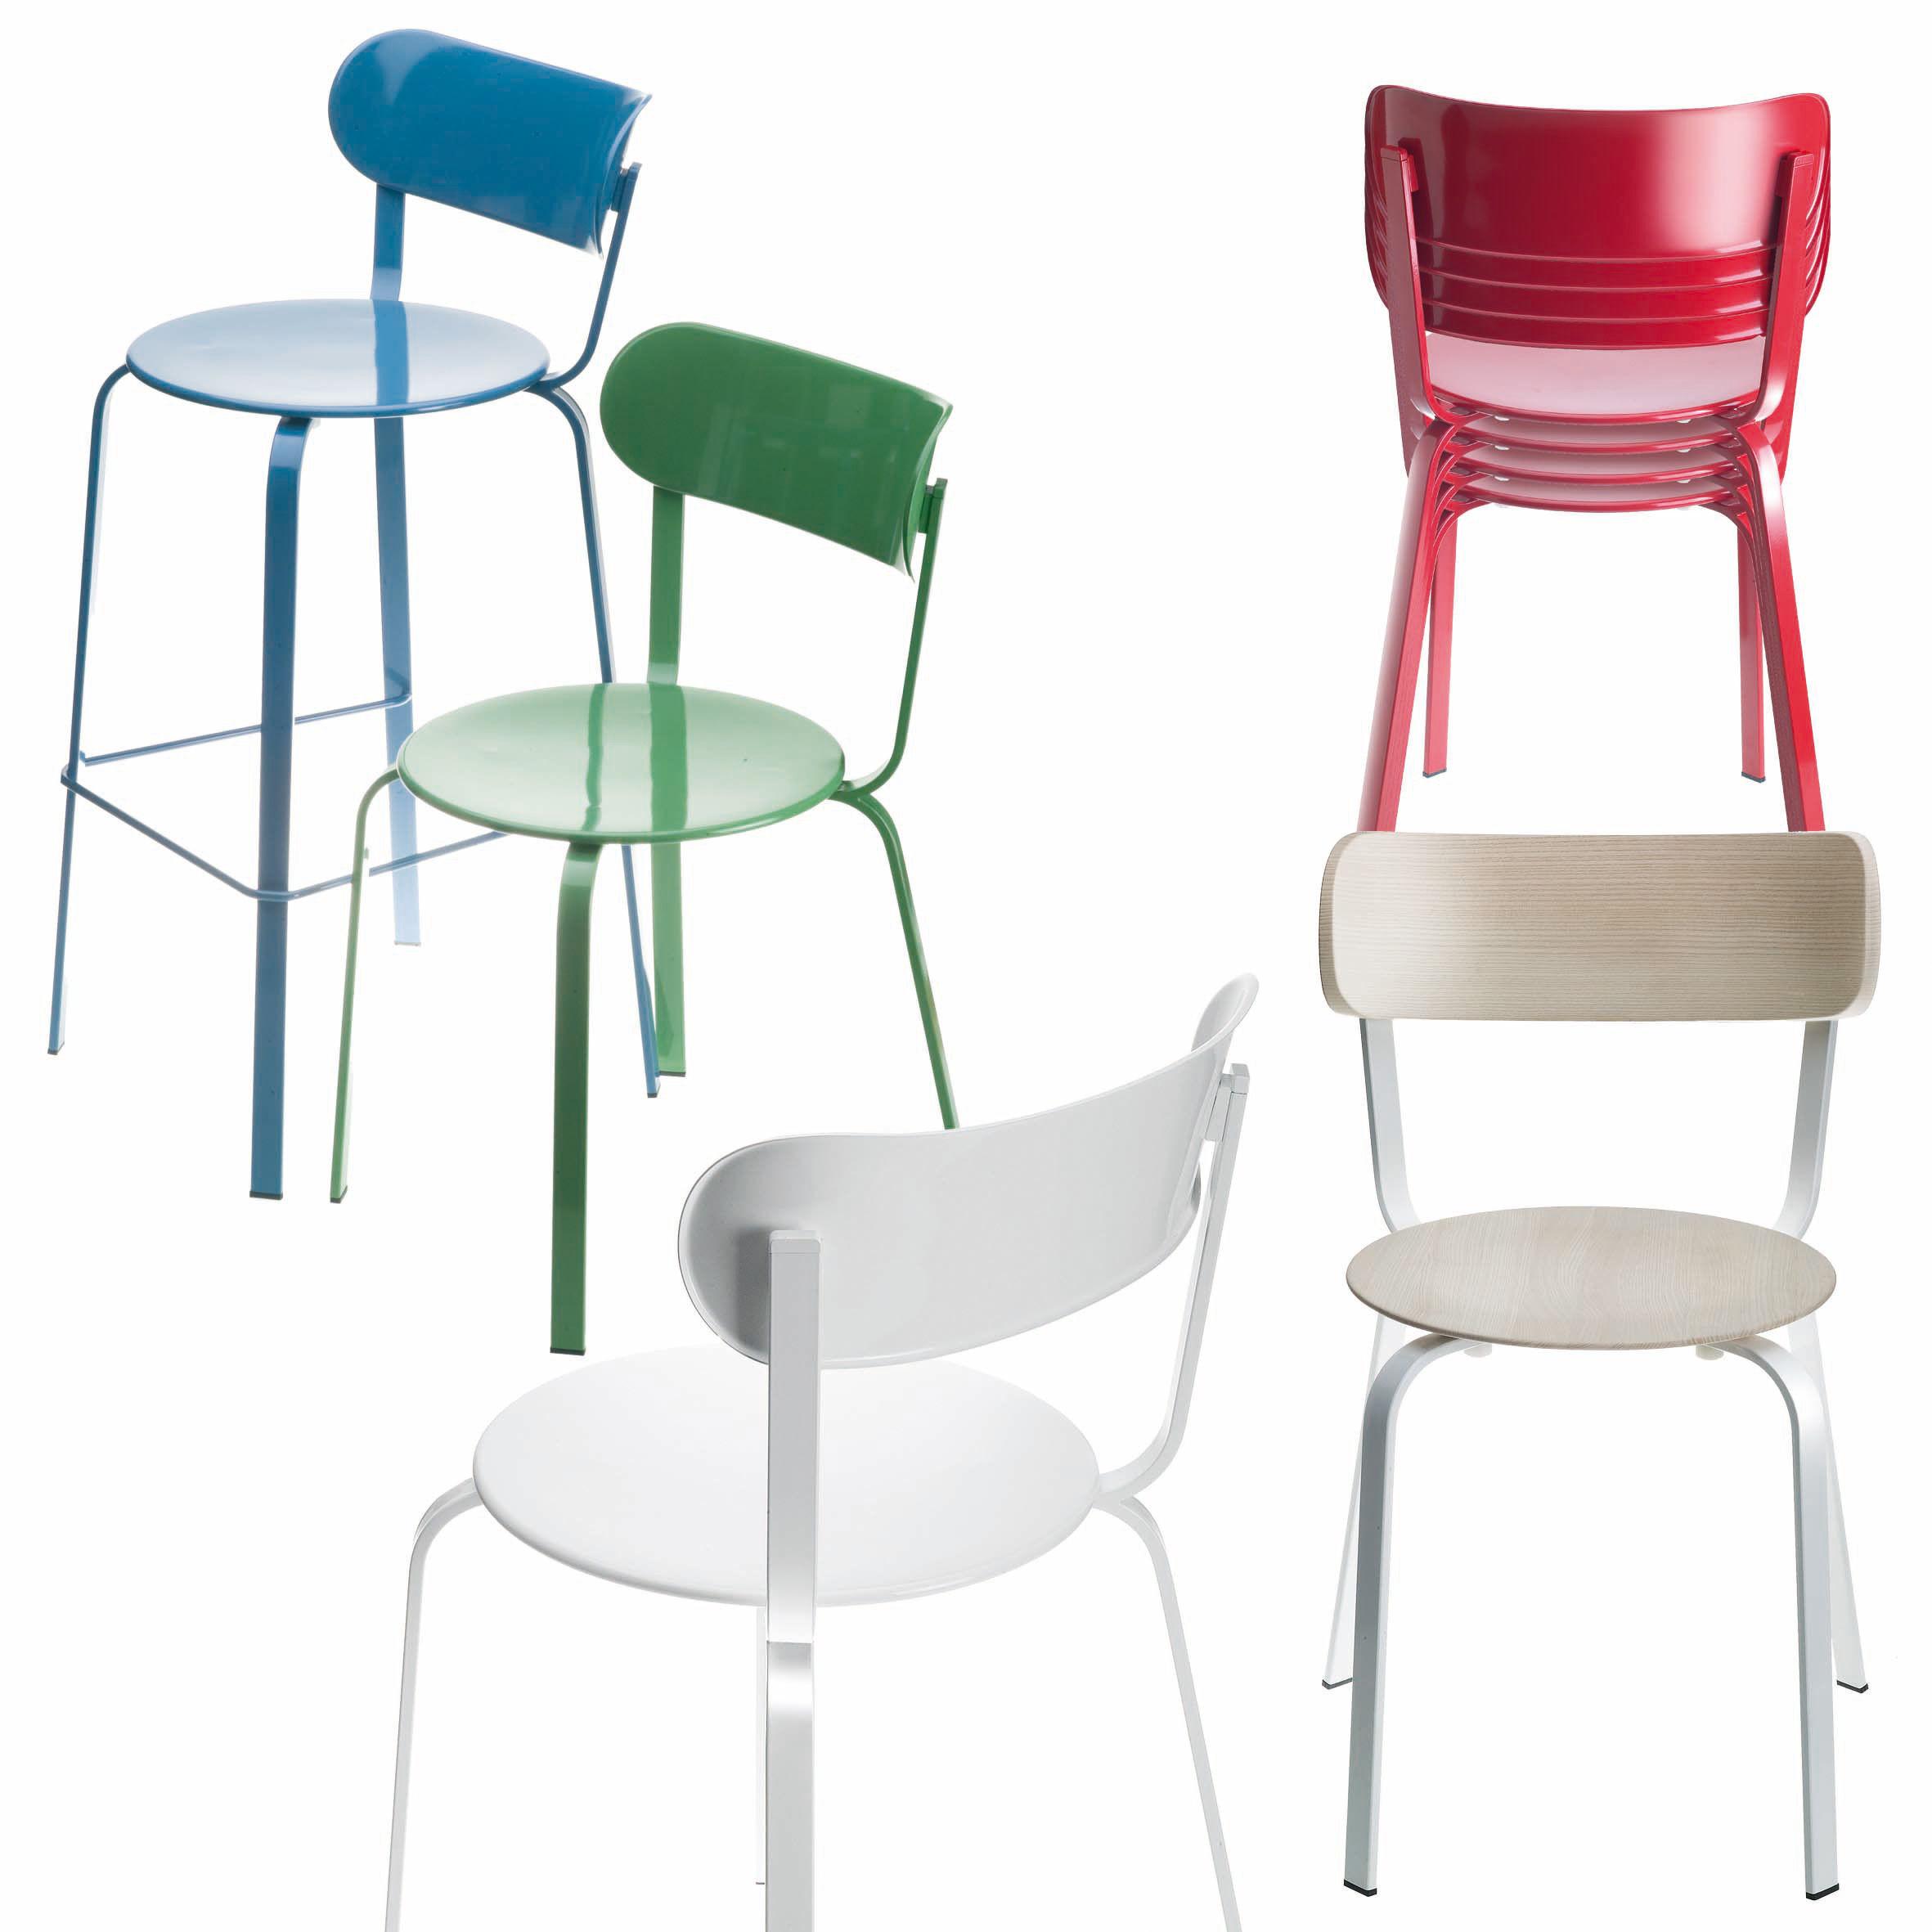 chaise empilable stil m tal m tal laqu blanc lapalma. Black Bedroom Furniture Sets. Home Design Ideas